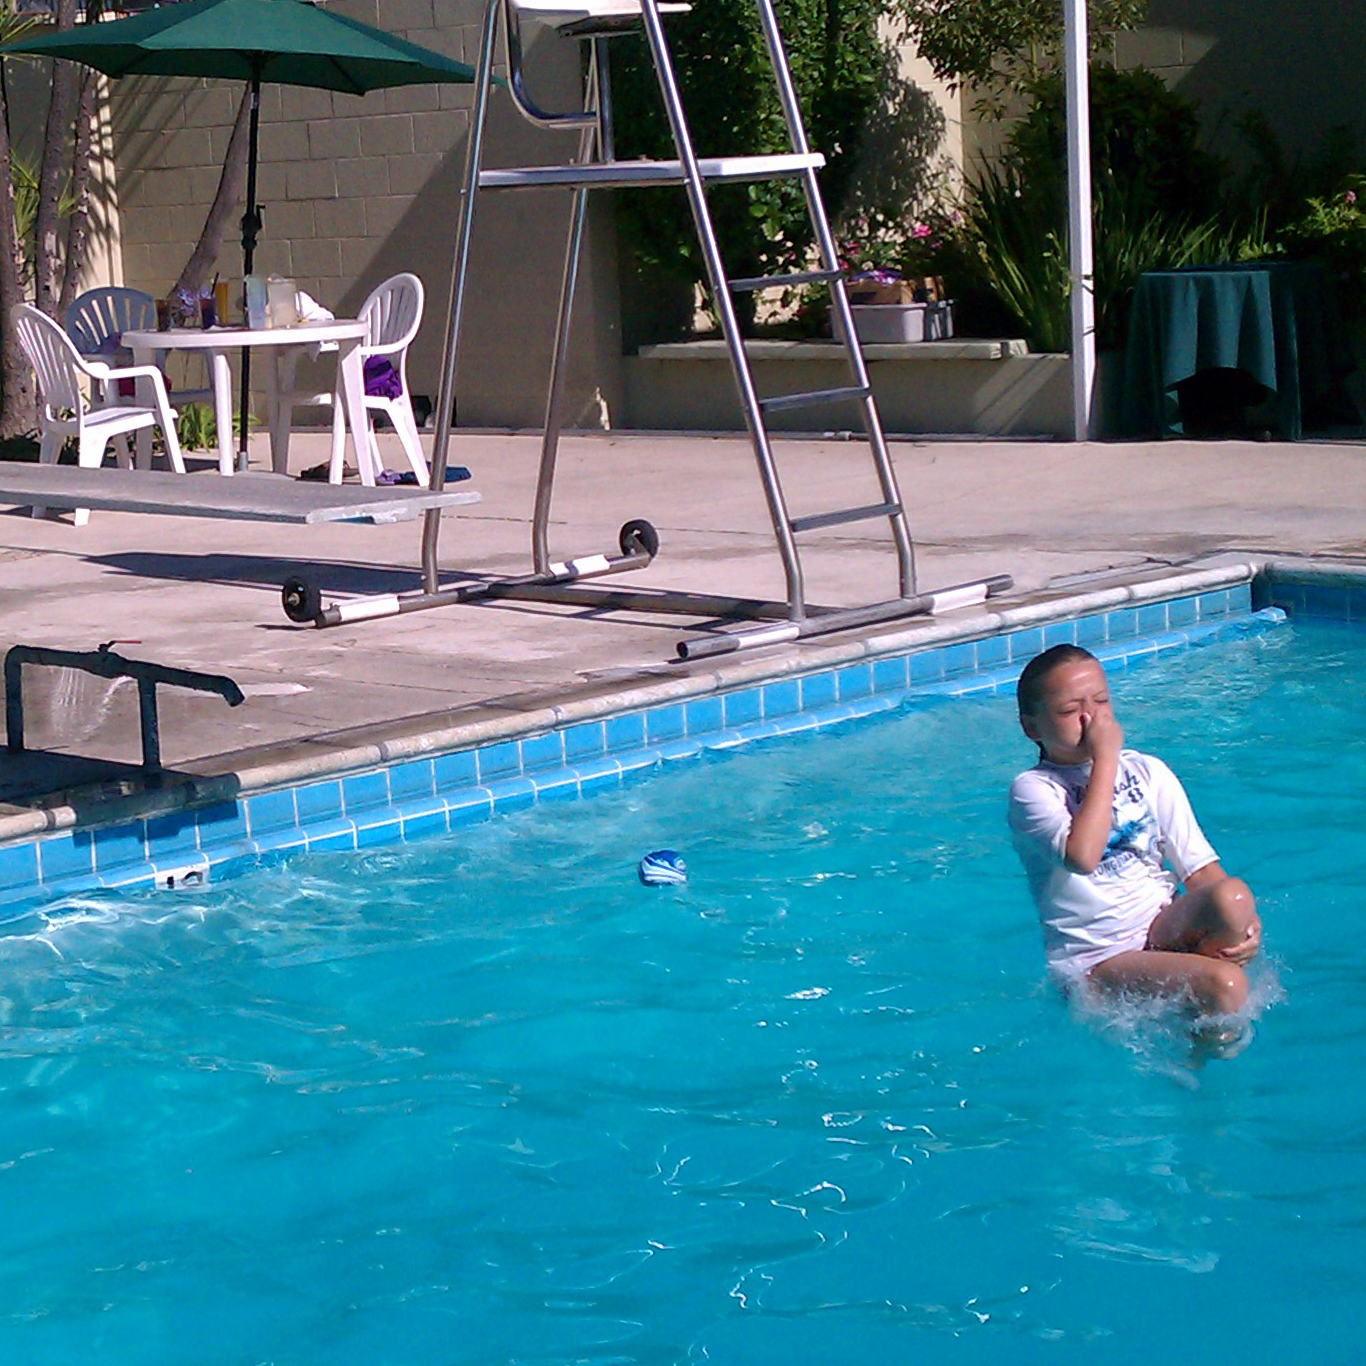 http://4.bp.blogspot.com/-mgdZistLZKM/TglZ7LSPn3I/AAAAAAAACYA/wlbw3bXQ-5o/s1600/swim2.jpg